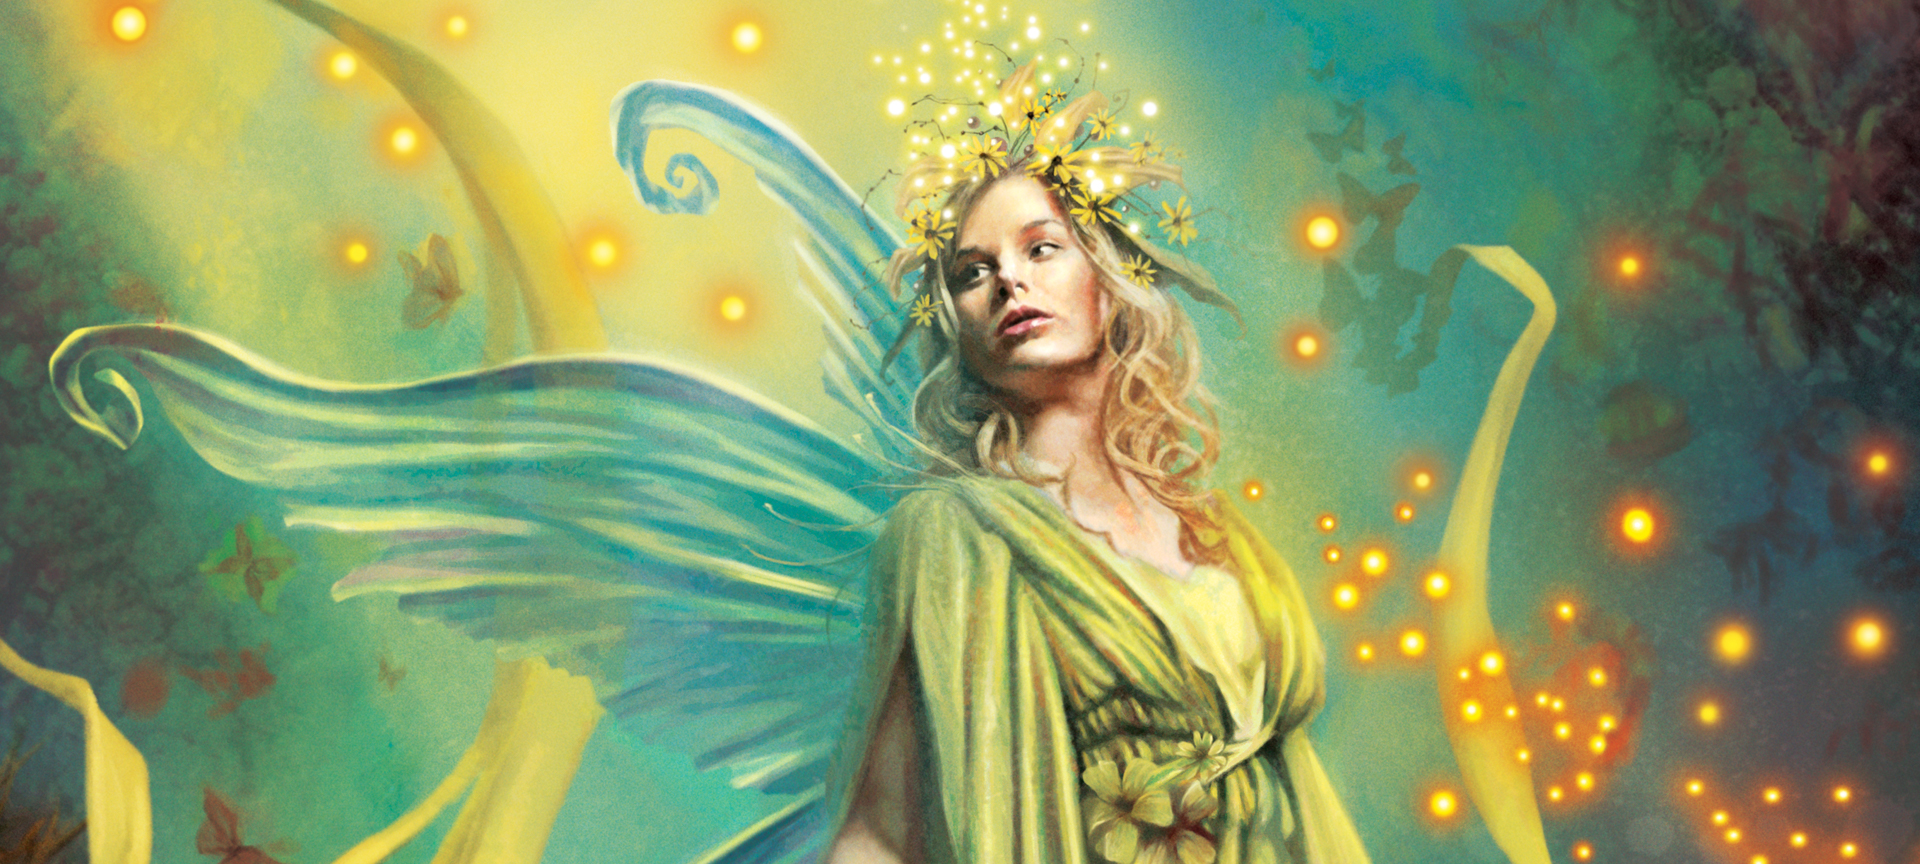 L Aliana The Fairy Queen Upirandthemonstergang Com